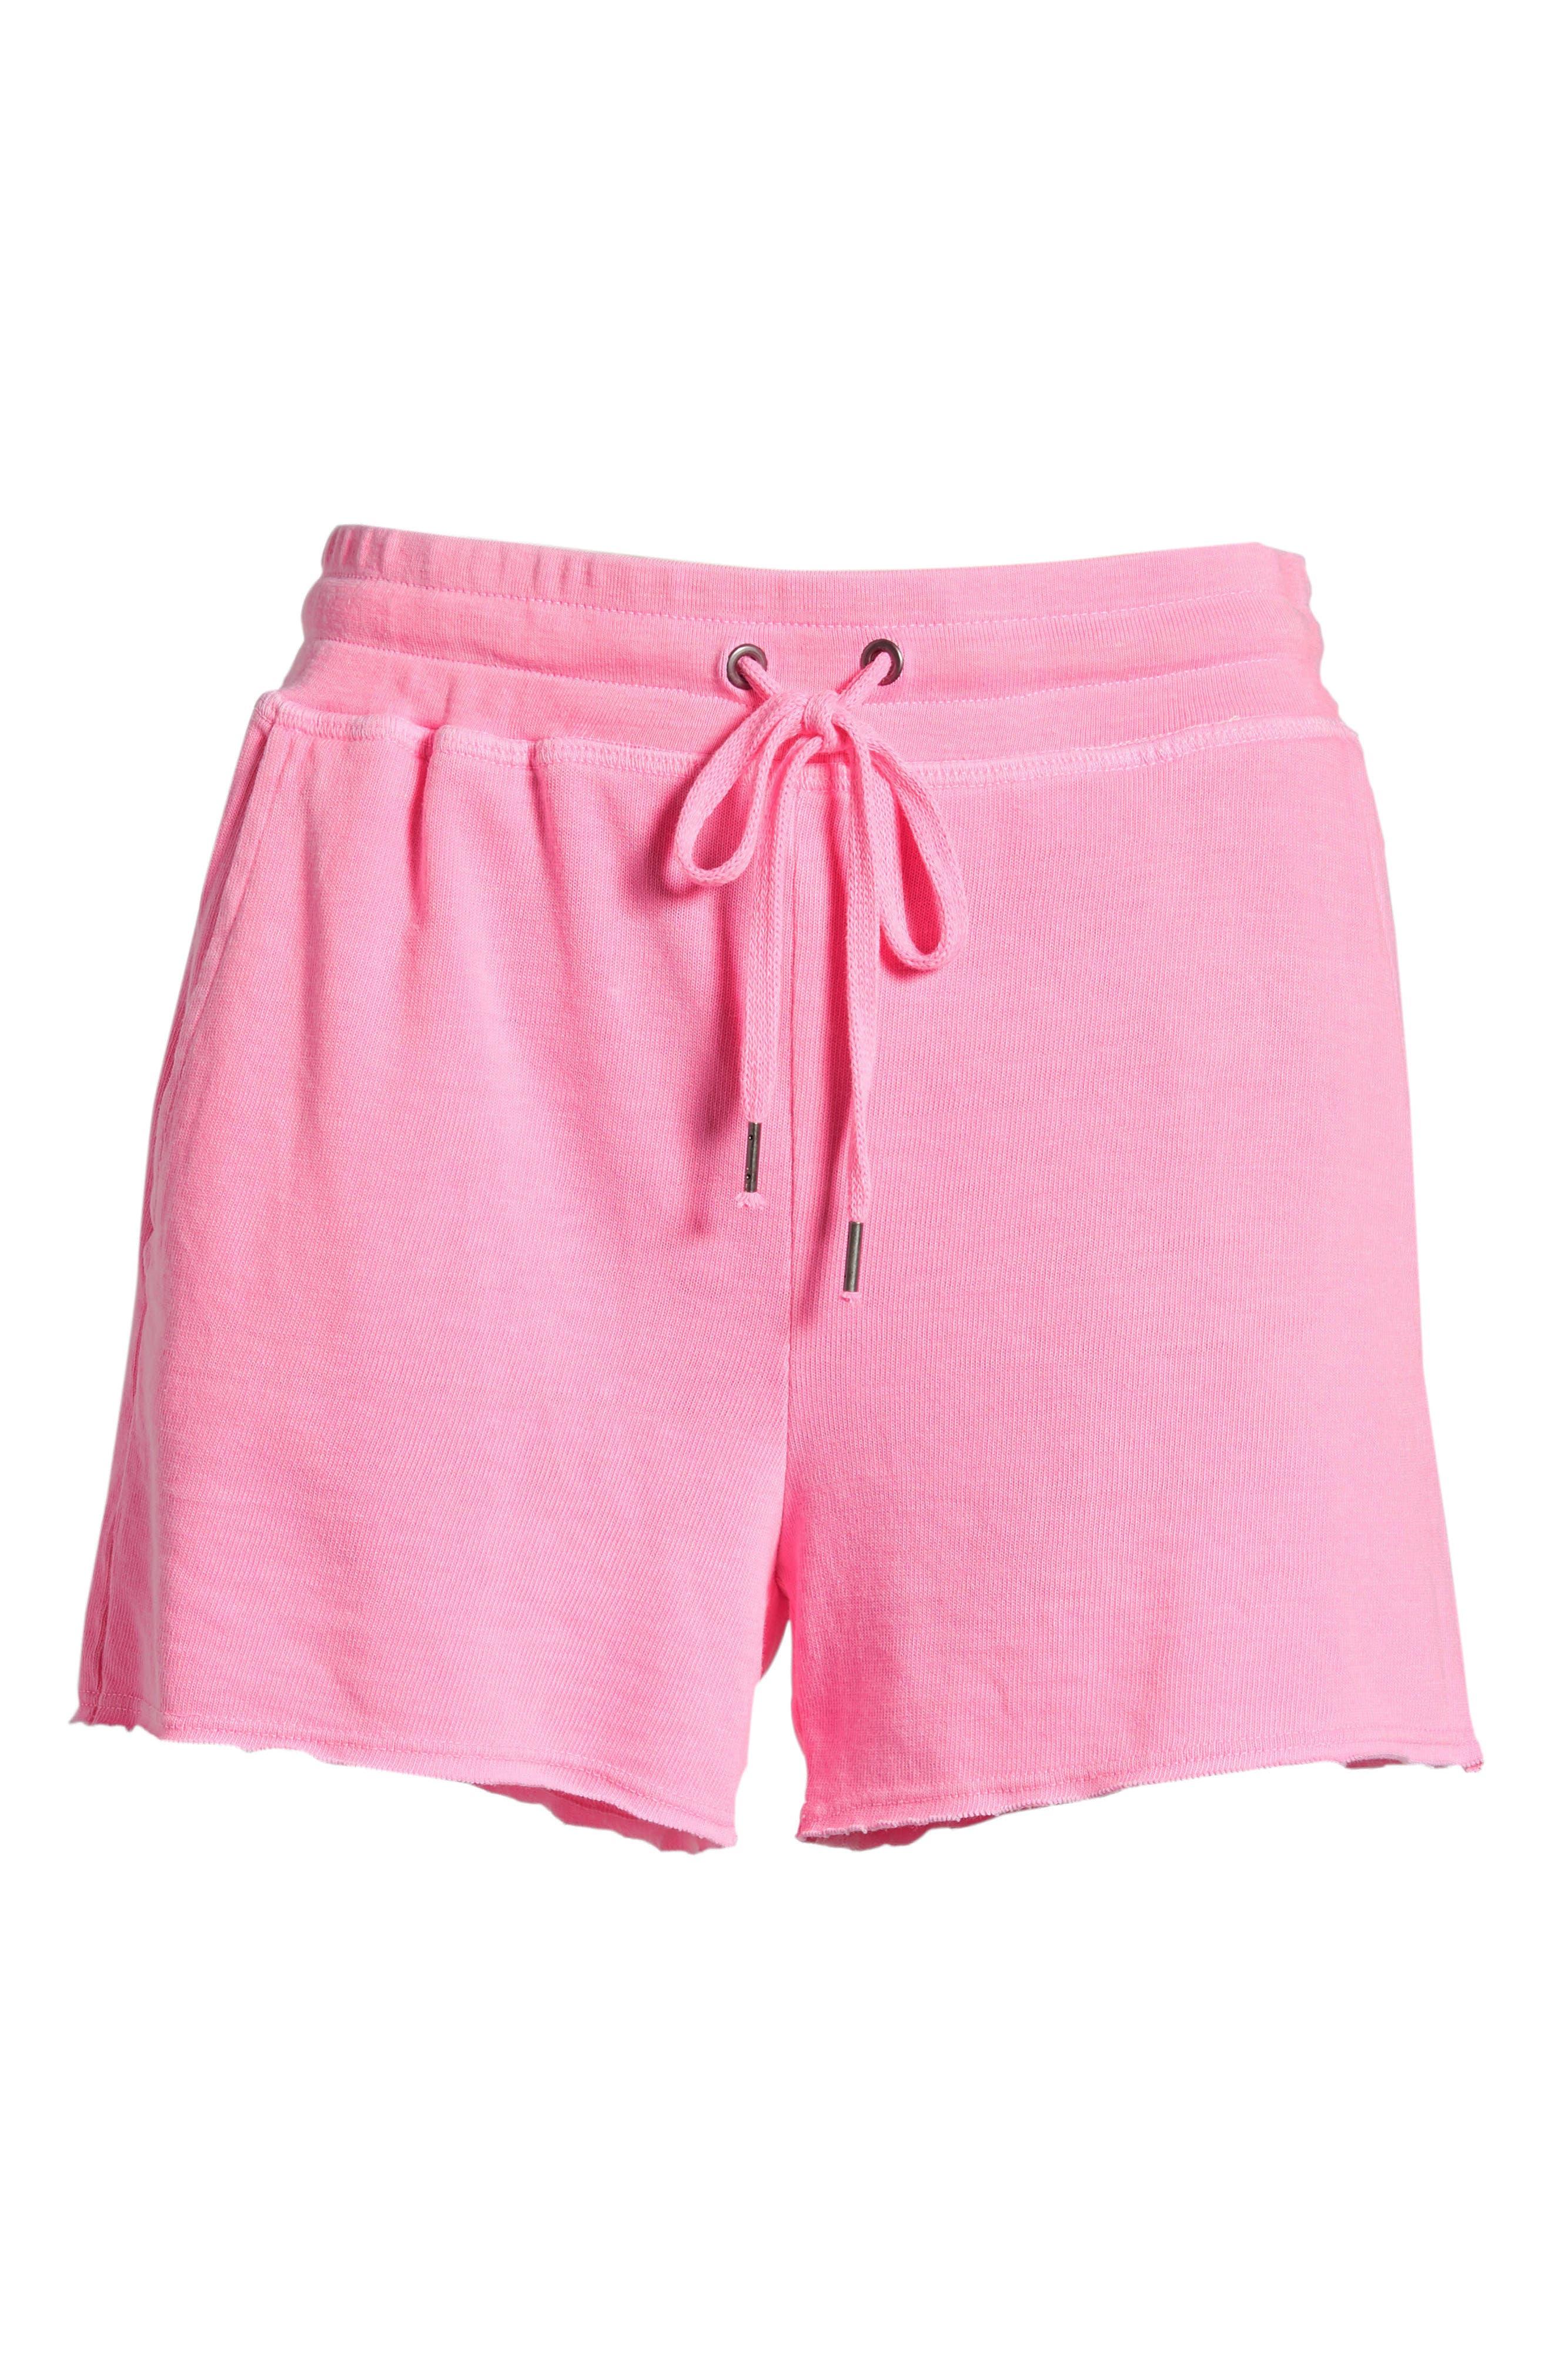 Active Shorts,                             Alternate thumbnail 6, color,                             653